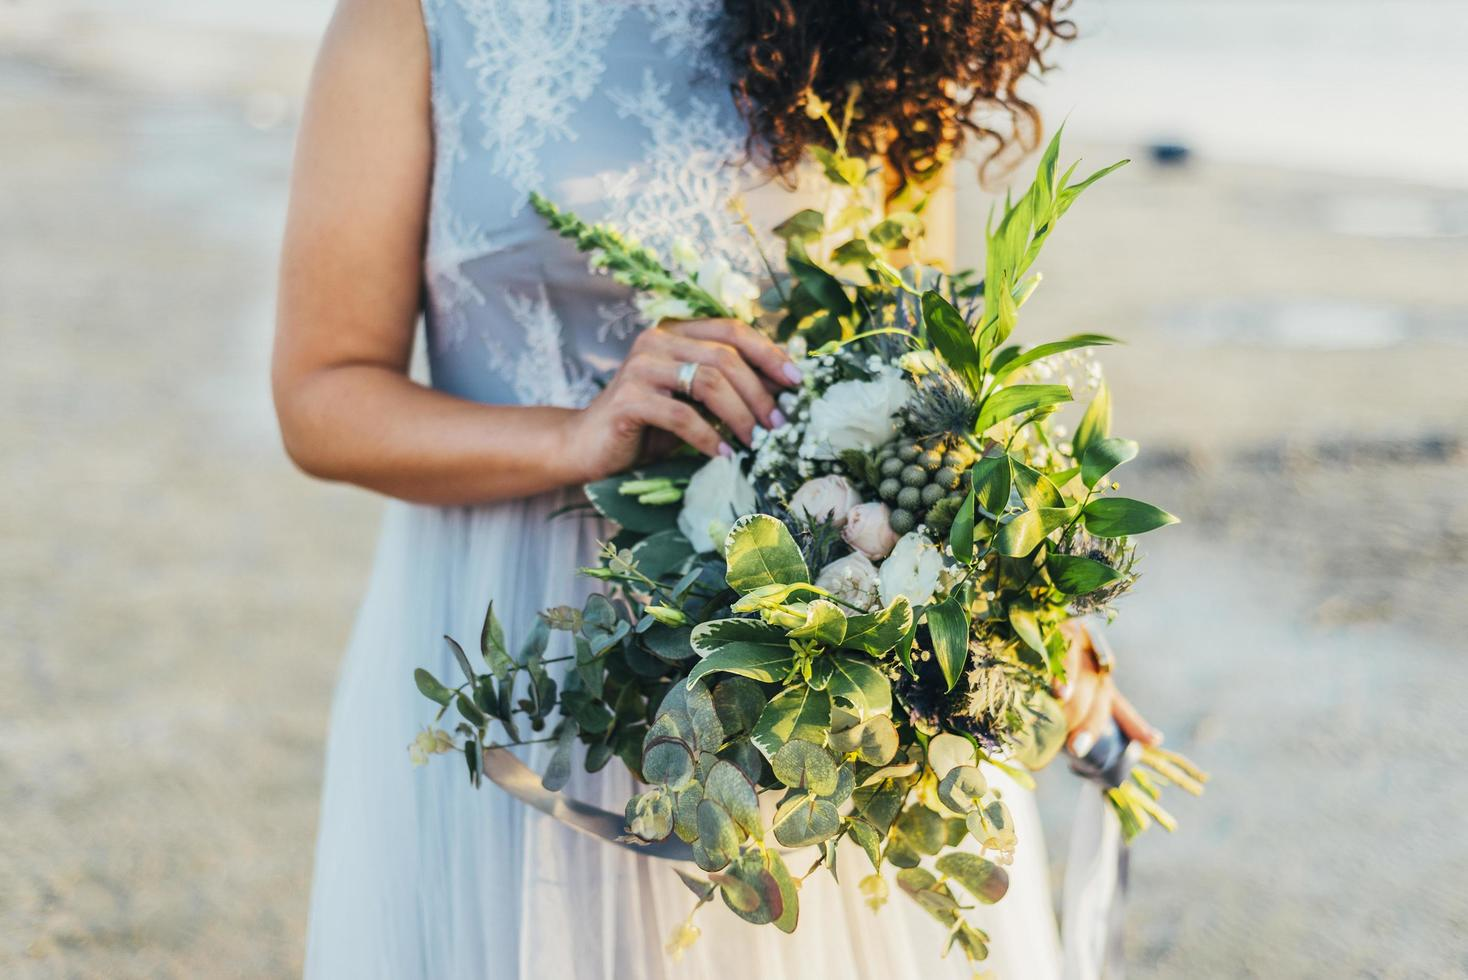 Bride holding wedding bouquet photo